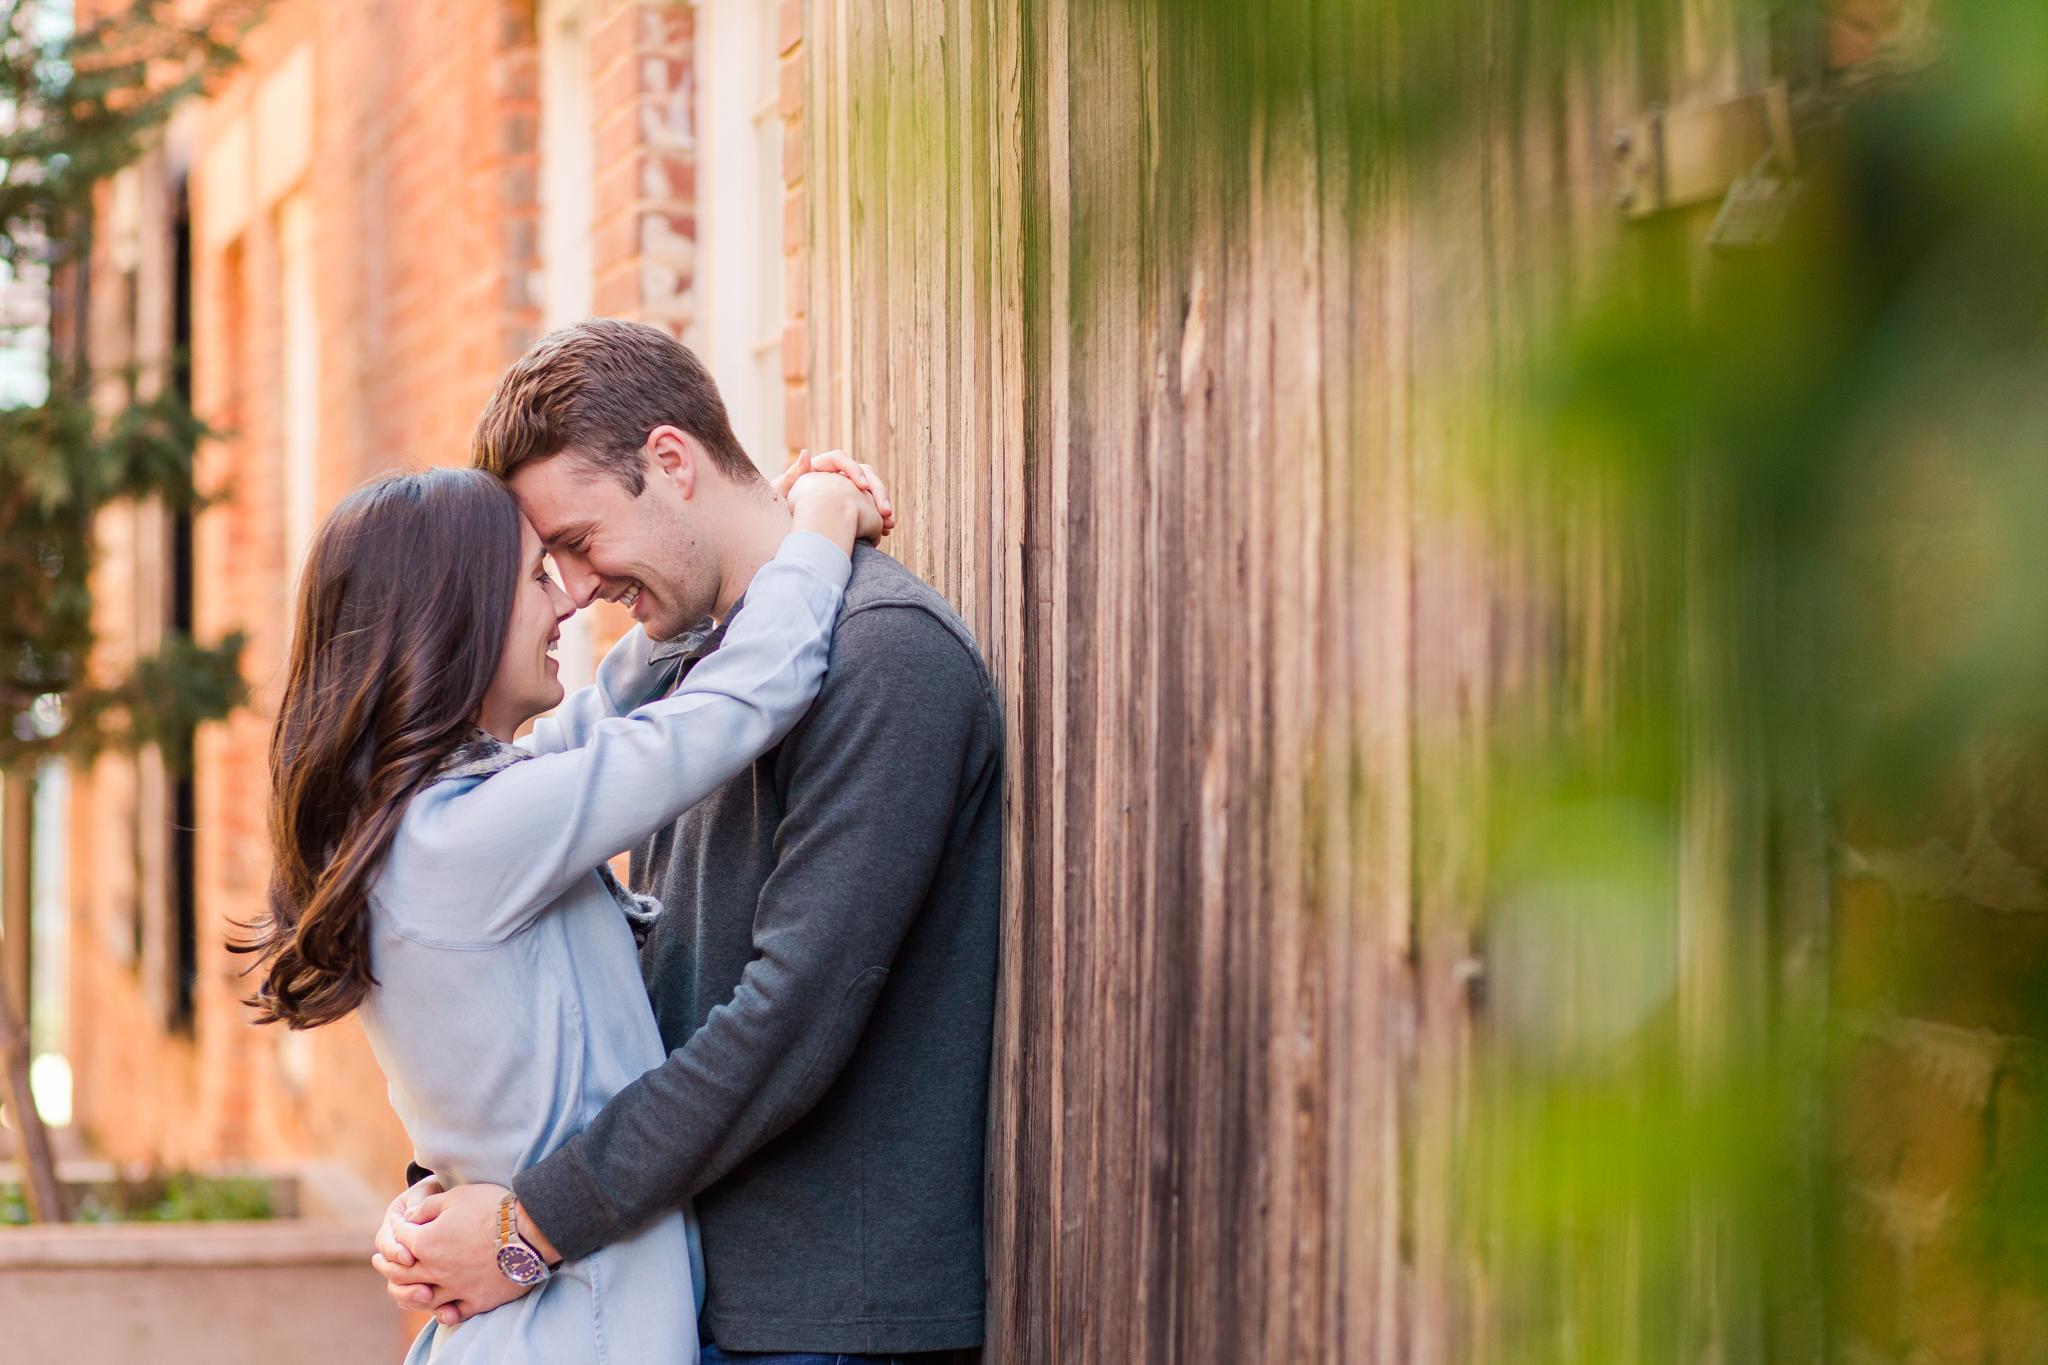 Ashley-Amber-Photo-Outdoor-Wedding-Photography-161937.jpg